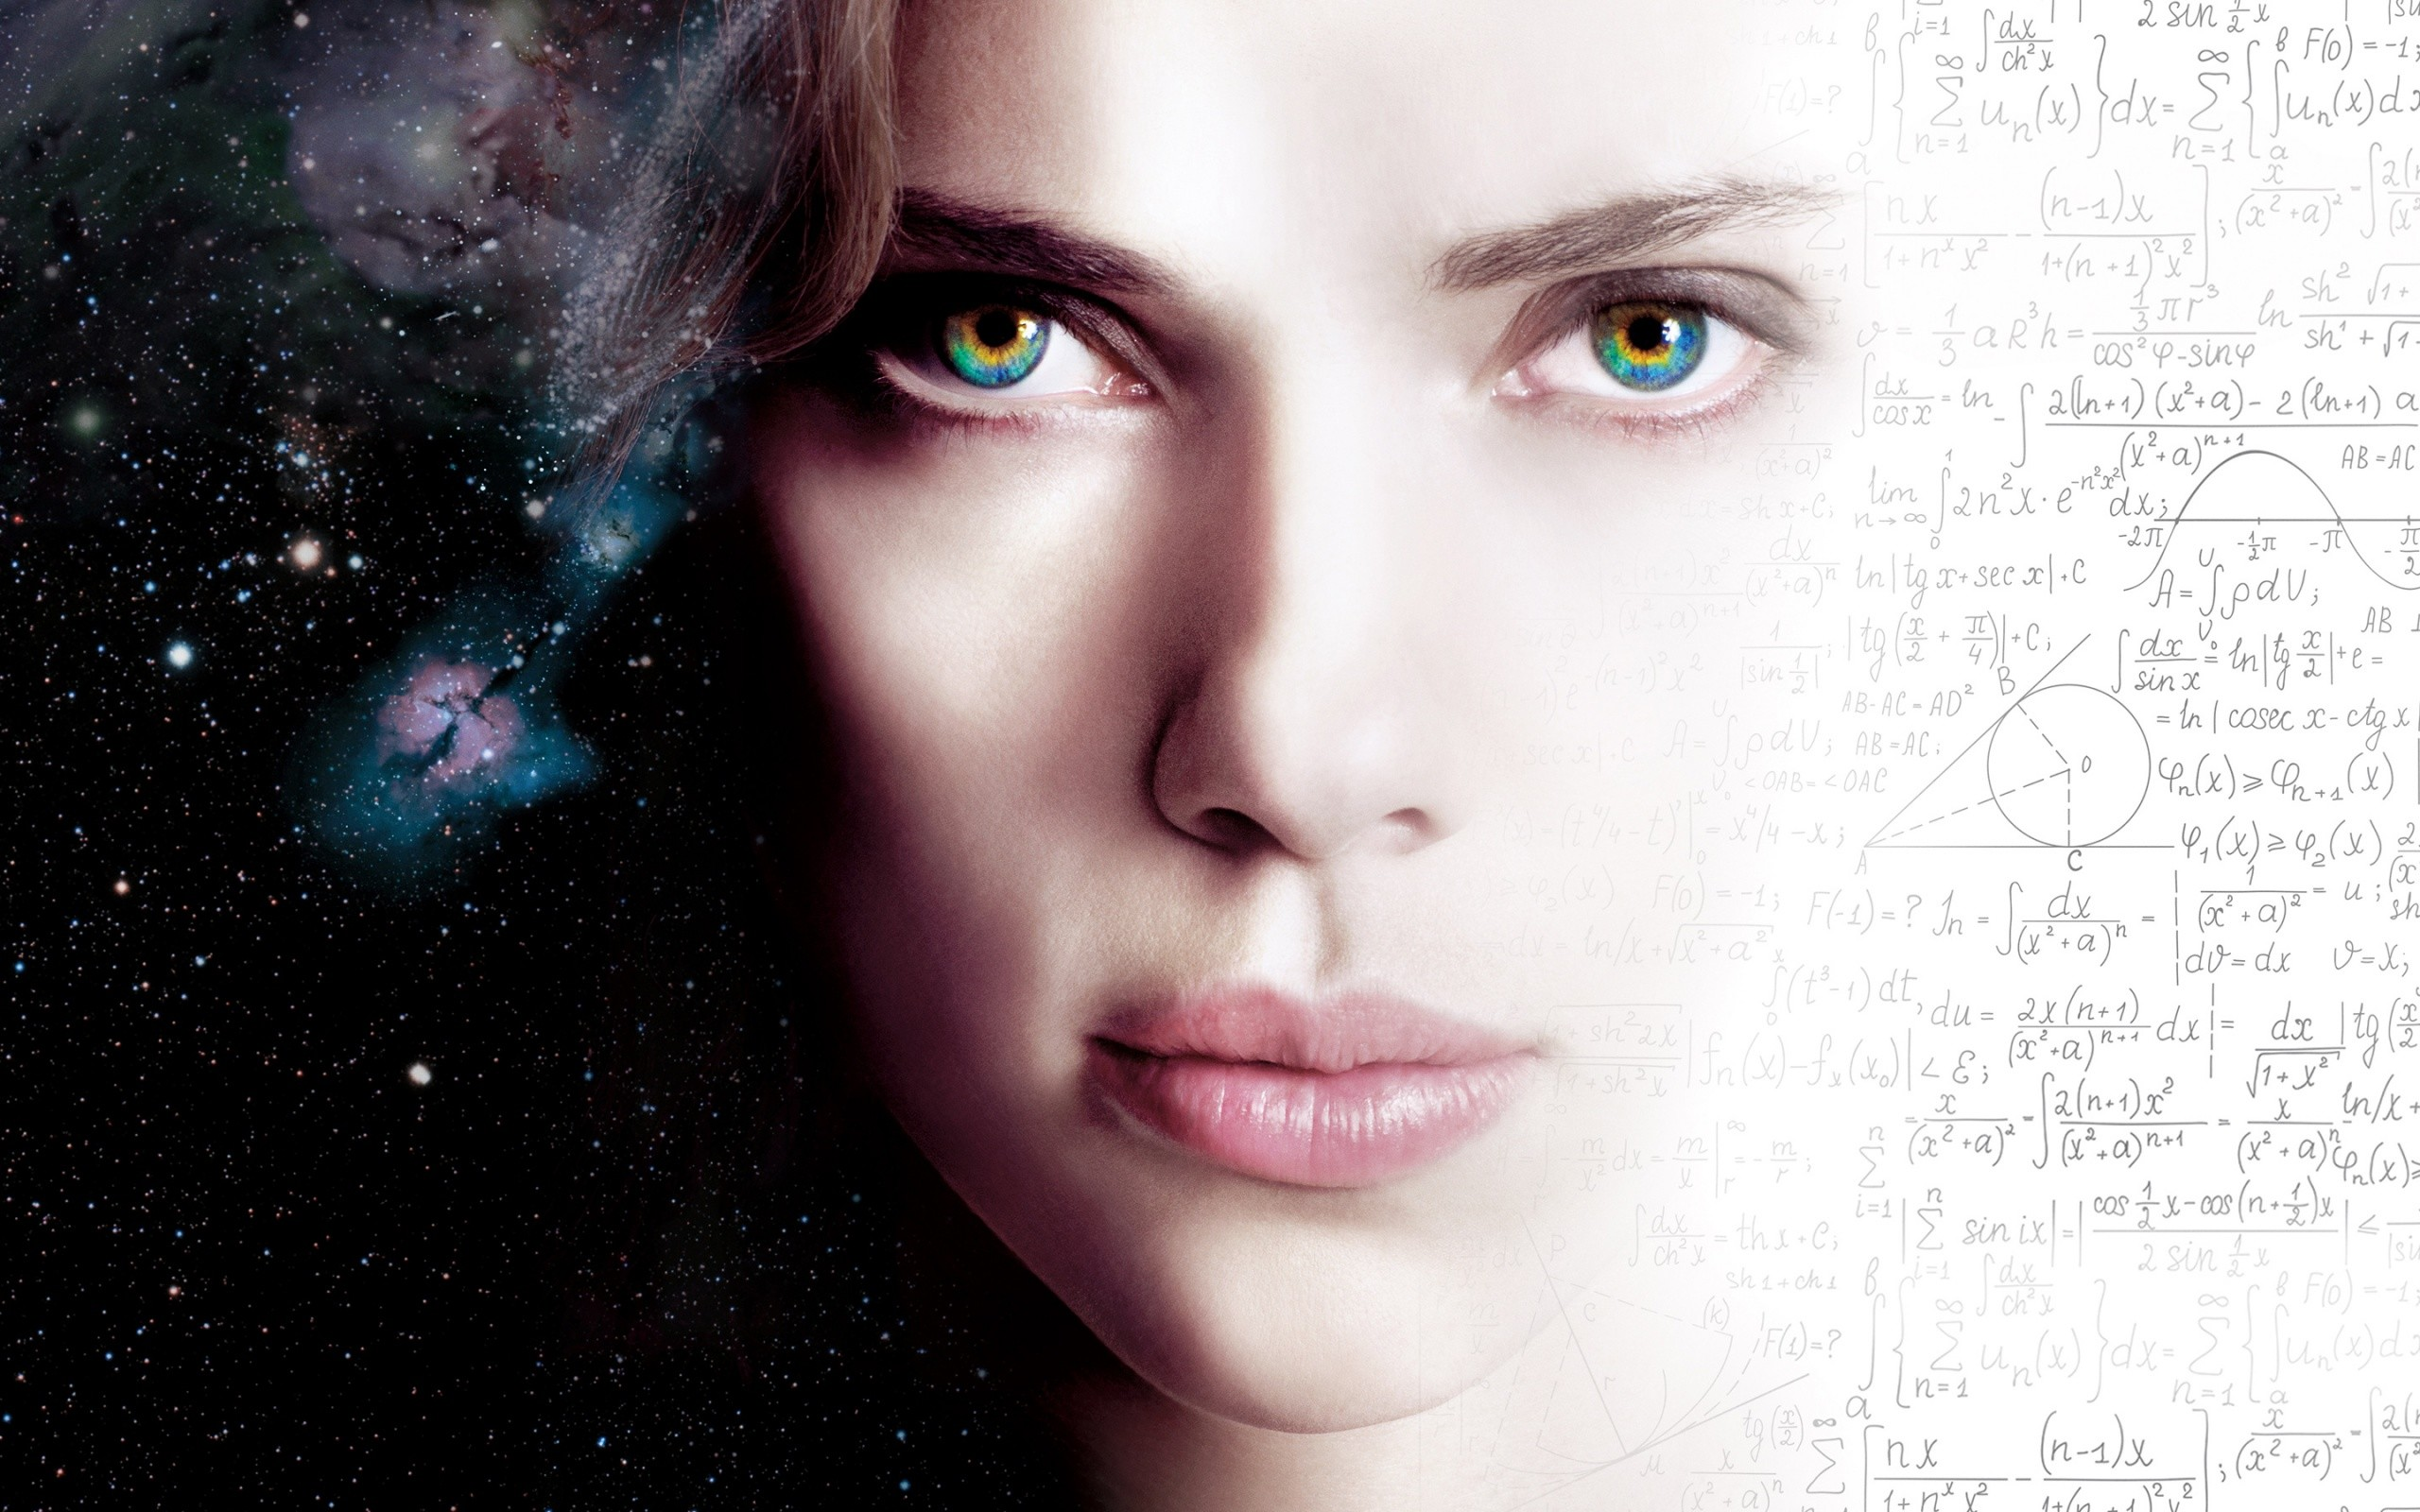 Wallpaper Scarlett Johansson 2014 Film Lucy HD 1080p